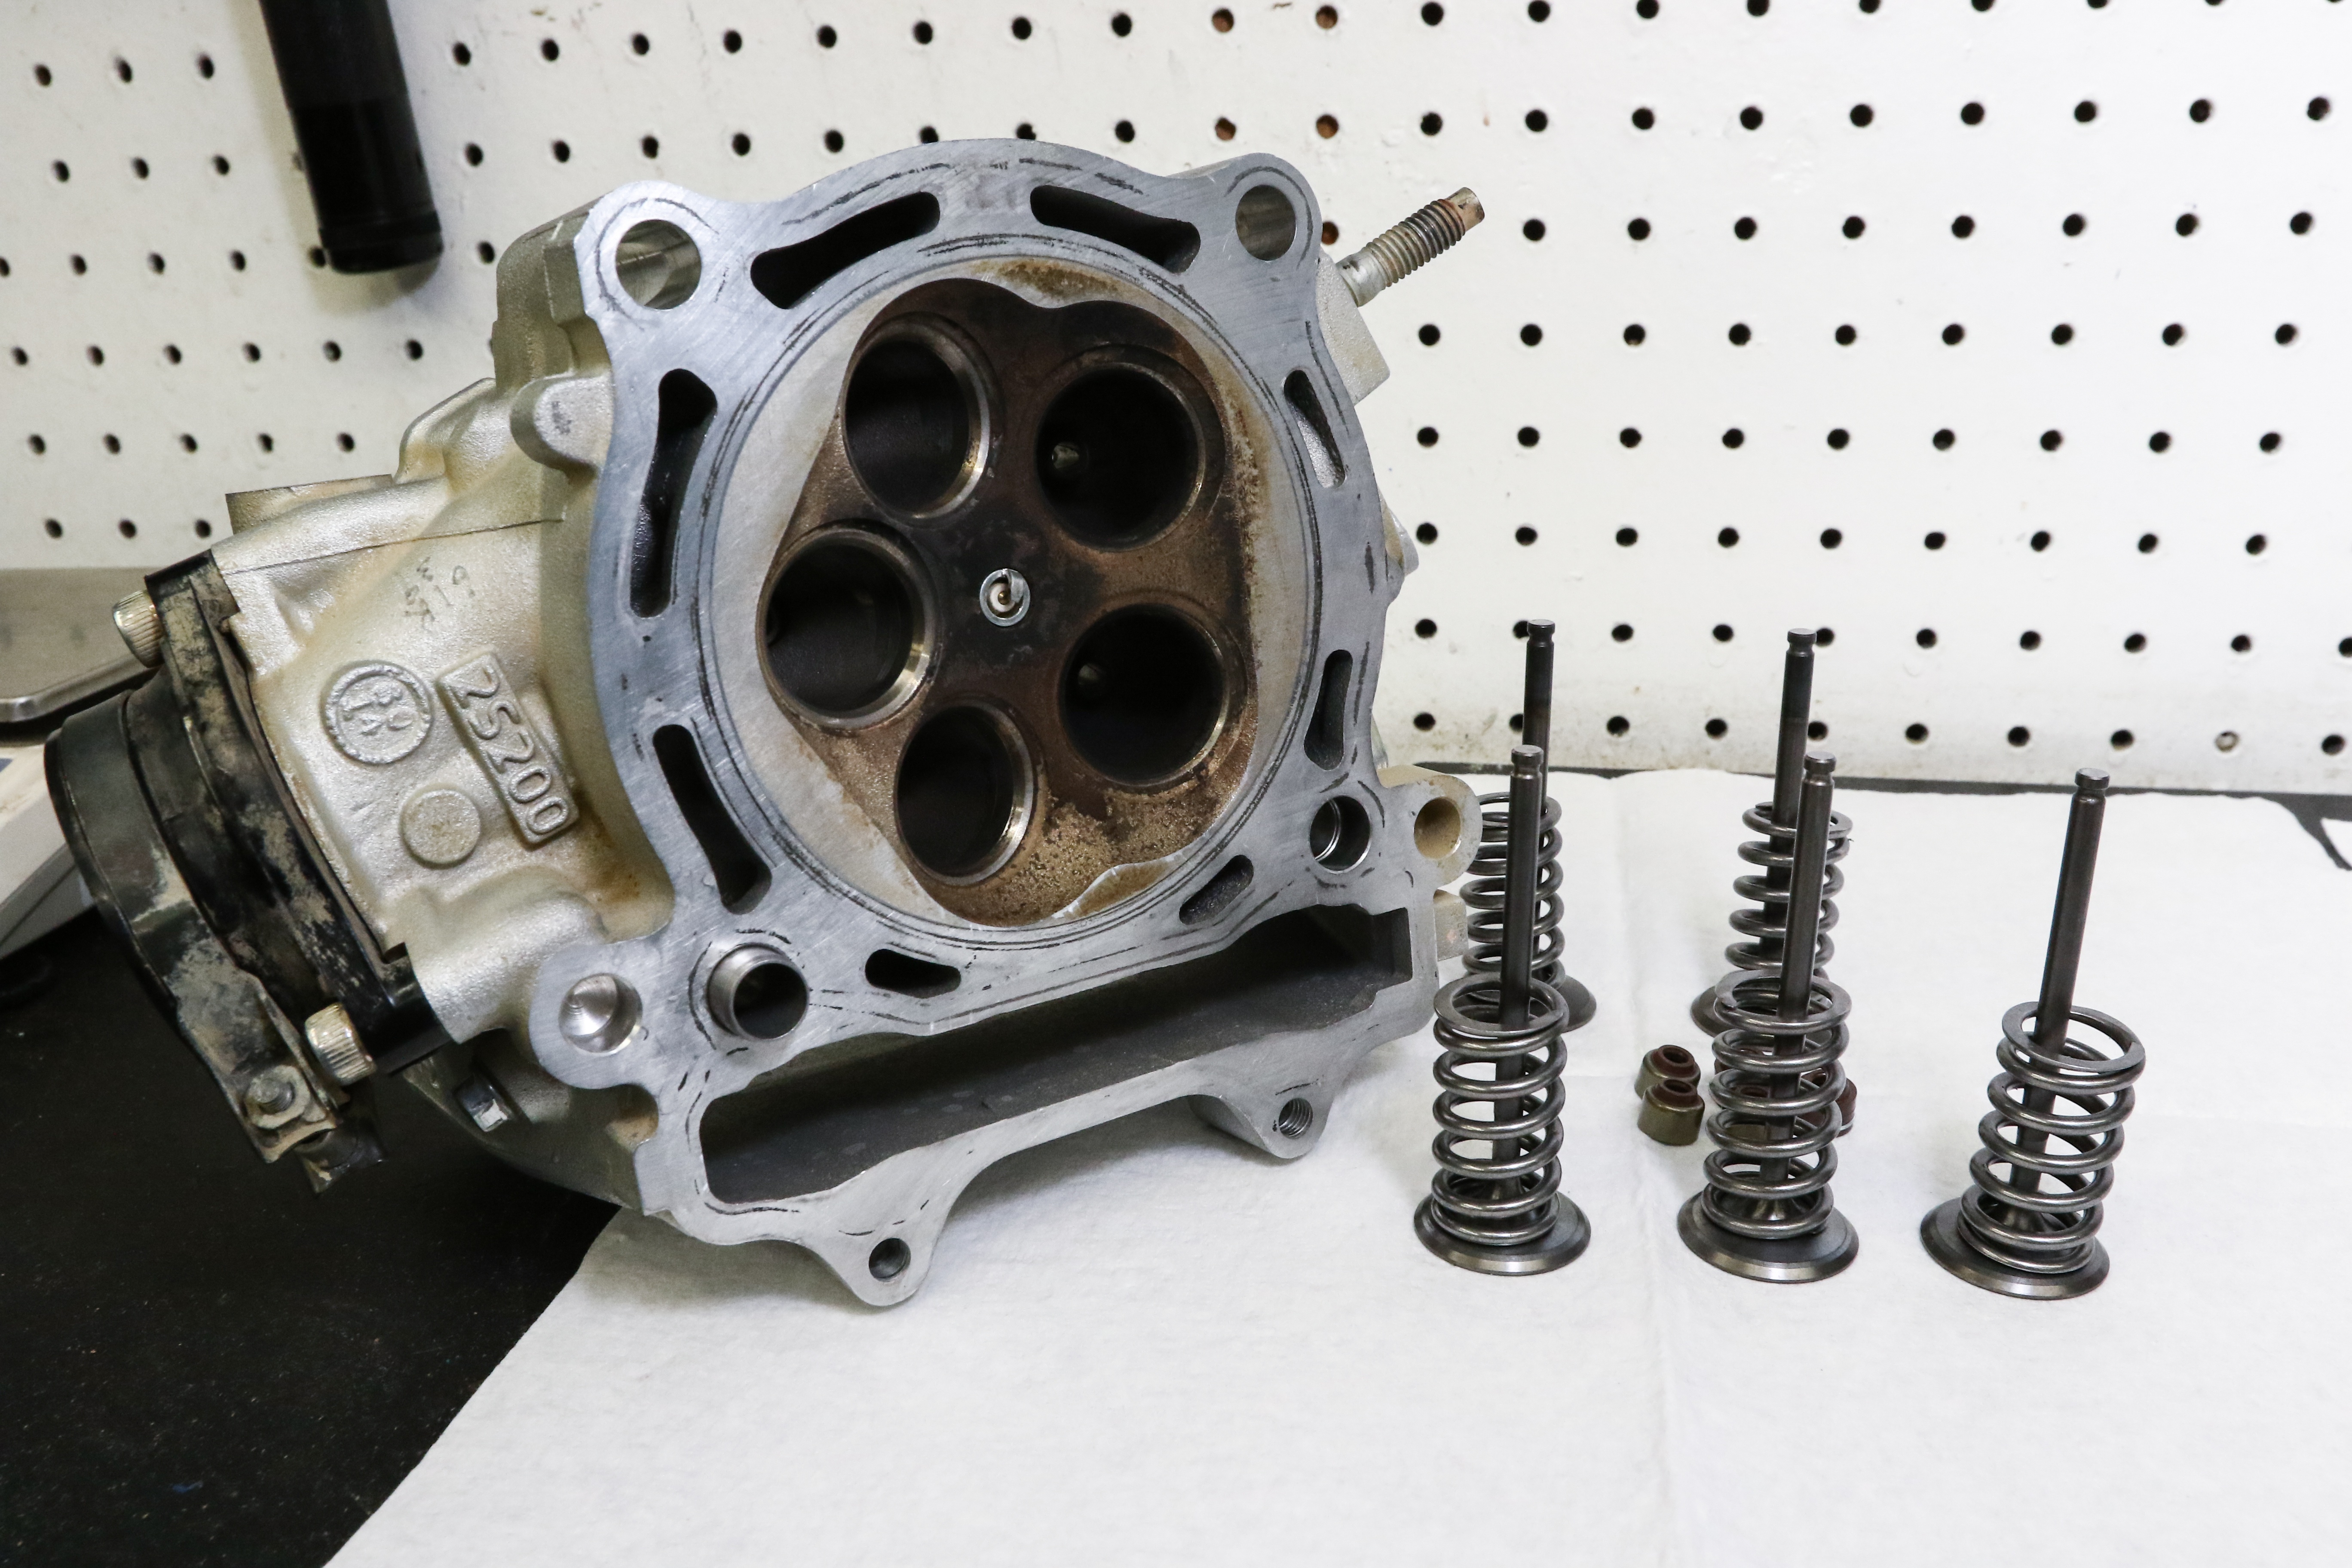 YZ450F Top End Part 2: Rebuilding a Four-Stroke Head